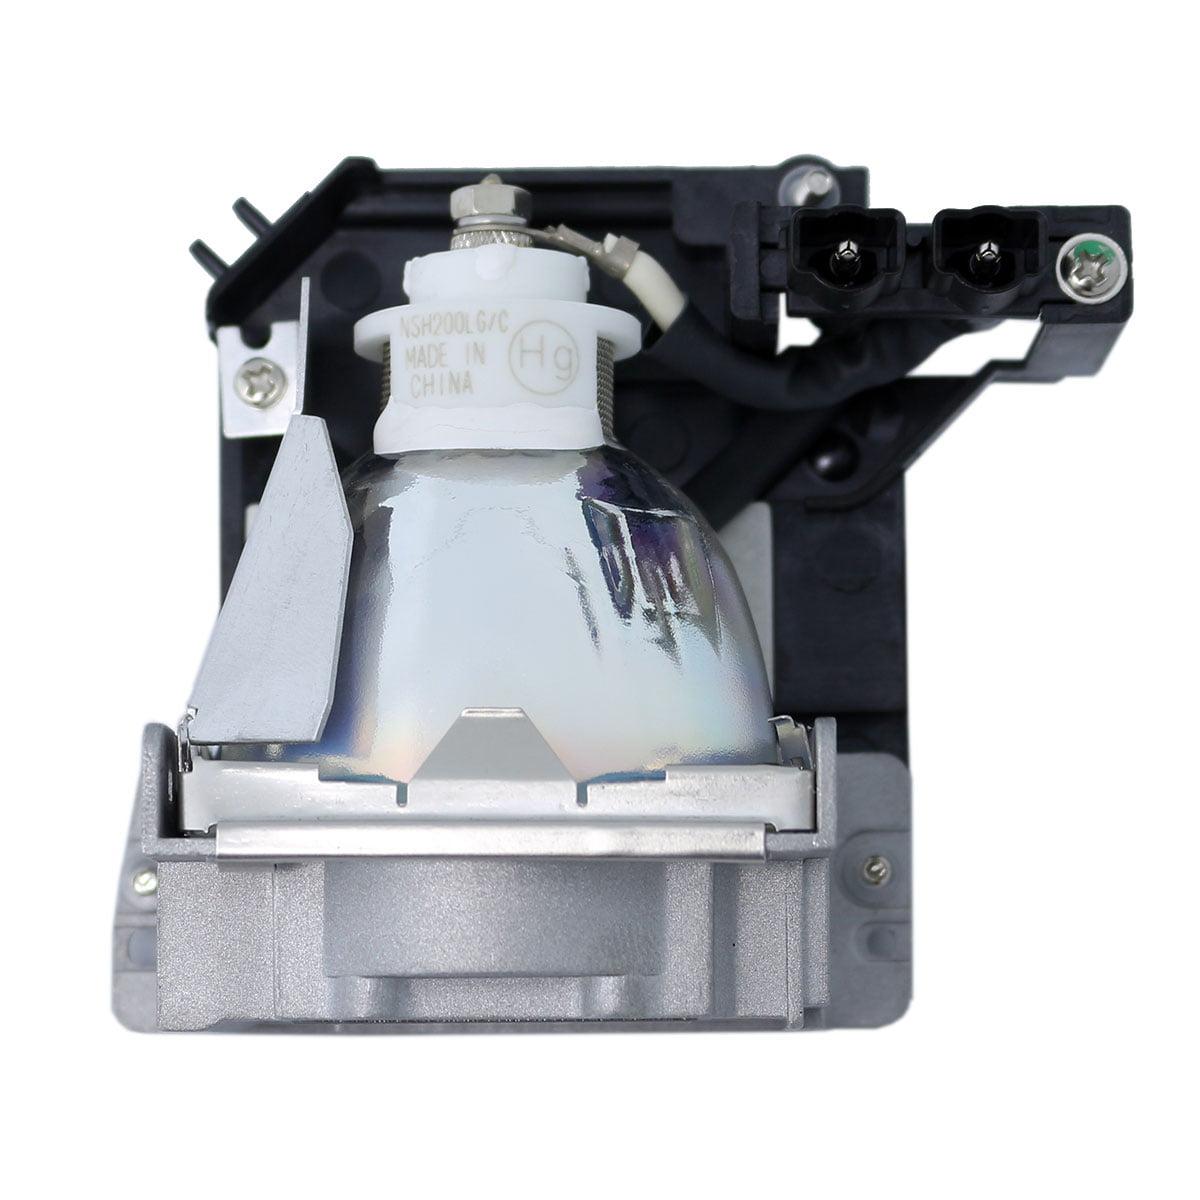 Original Ushio Projector Replacement Lamp for Mitsubishi HD1000